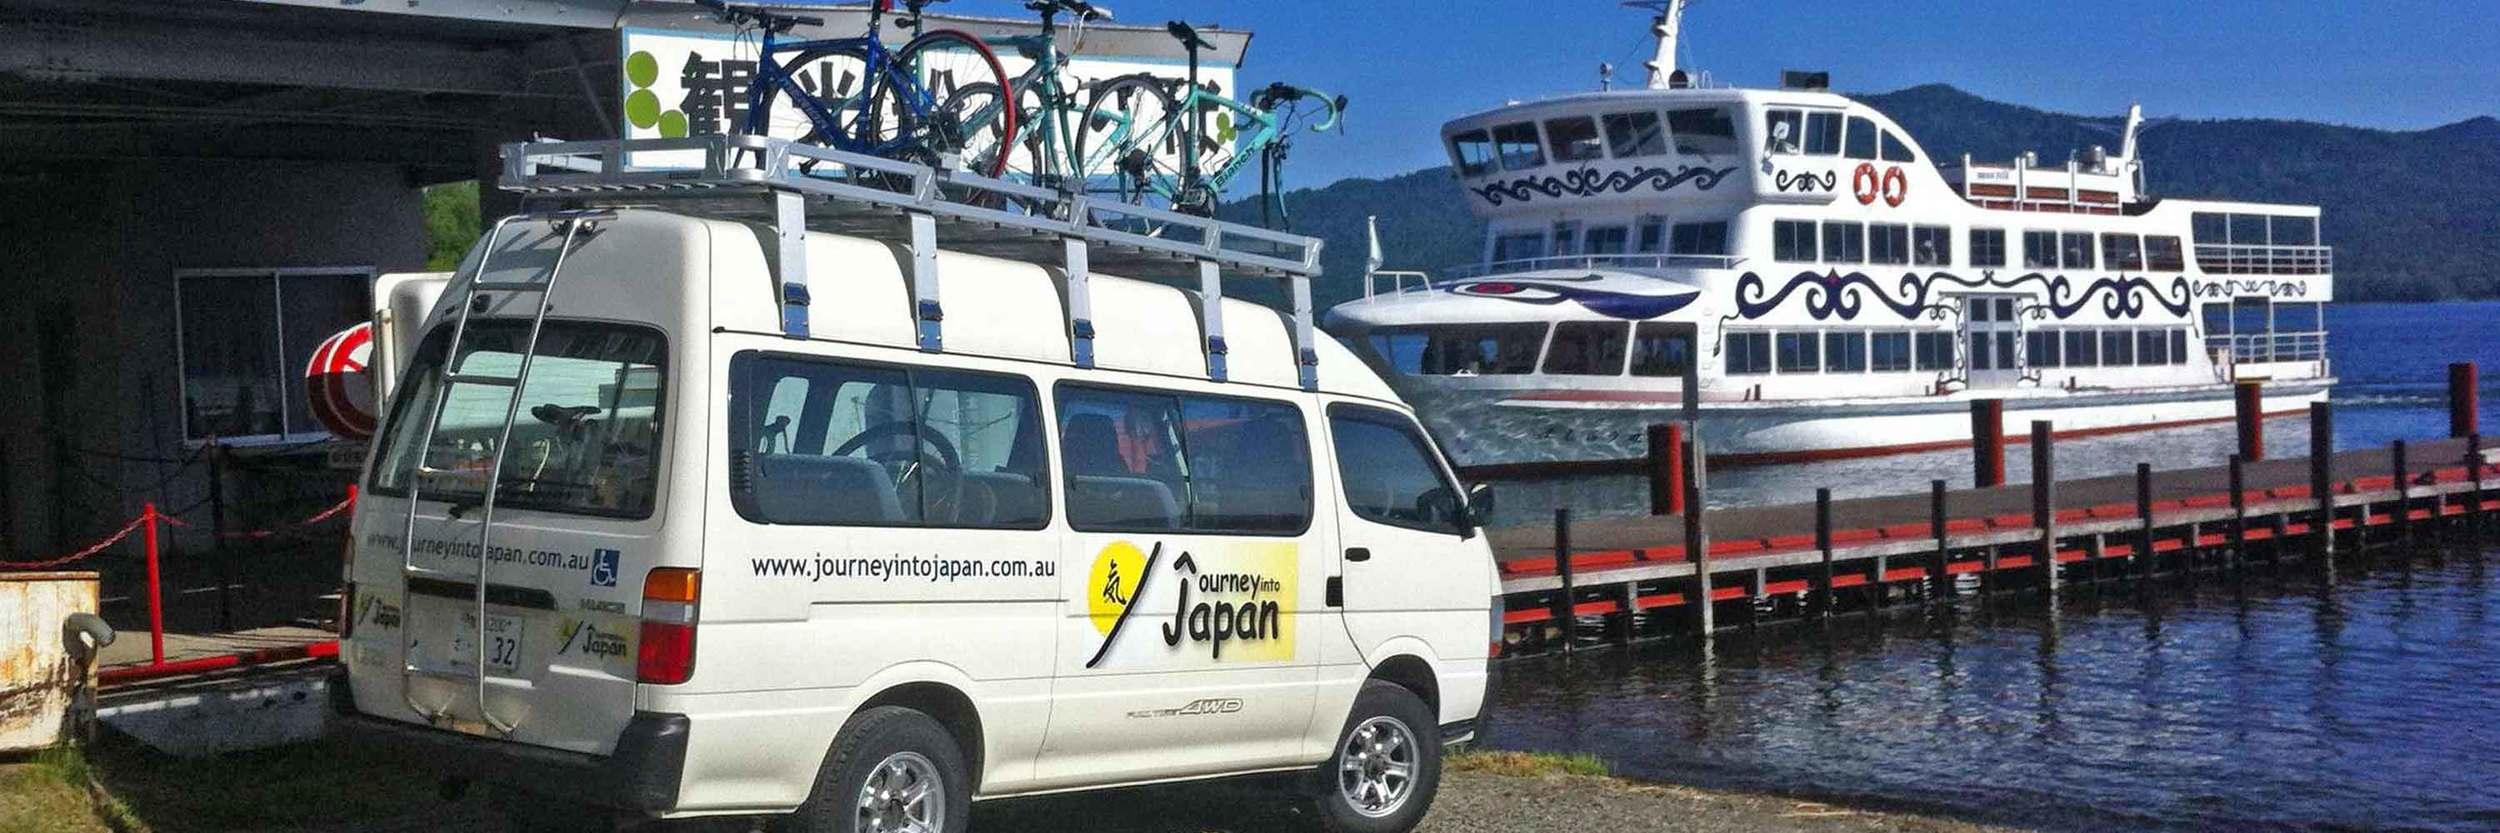 Cycle Japan support vehicle, Lake Akan Hokkaido.